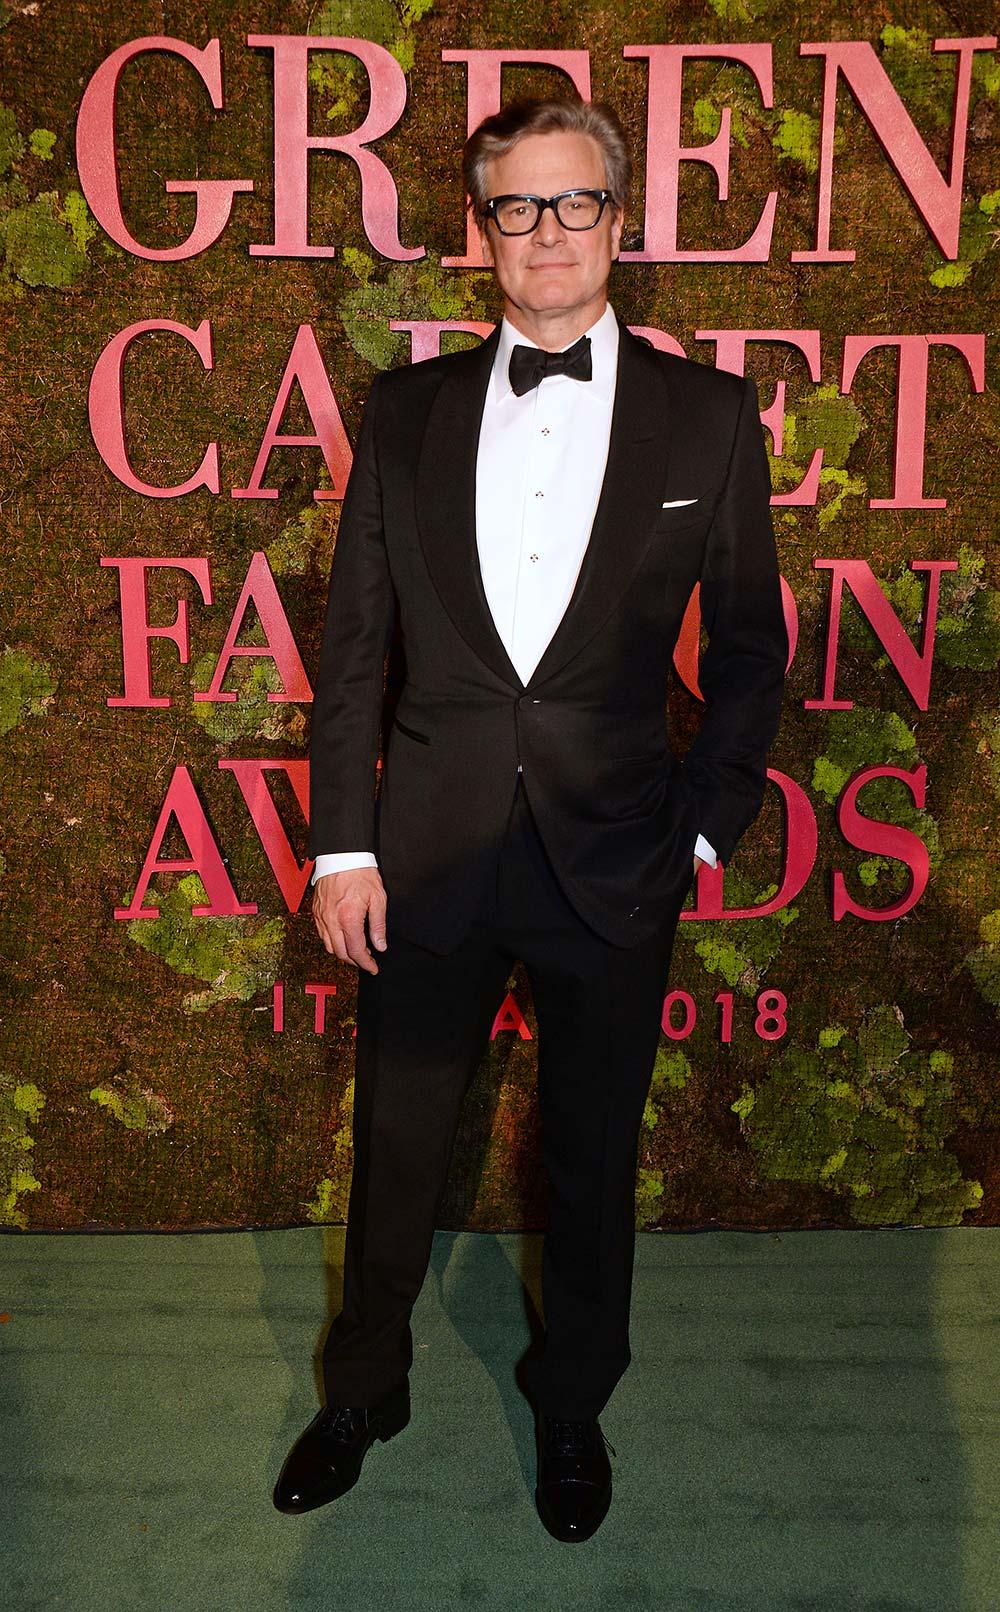 Green Carpet Fashion Awards 2018 - Colin Firth - Grooming Massimo Serini Team